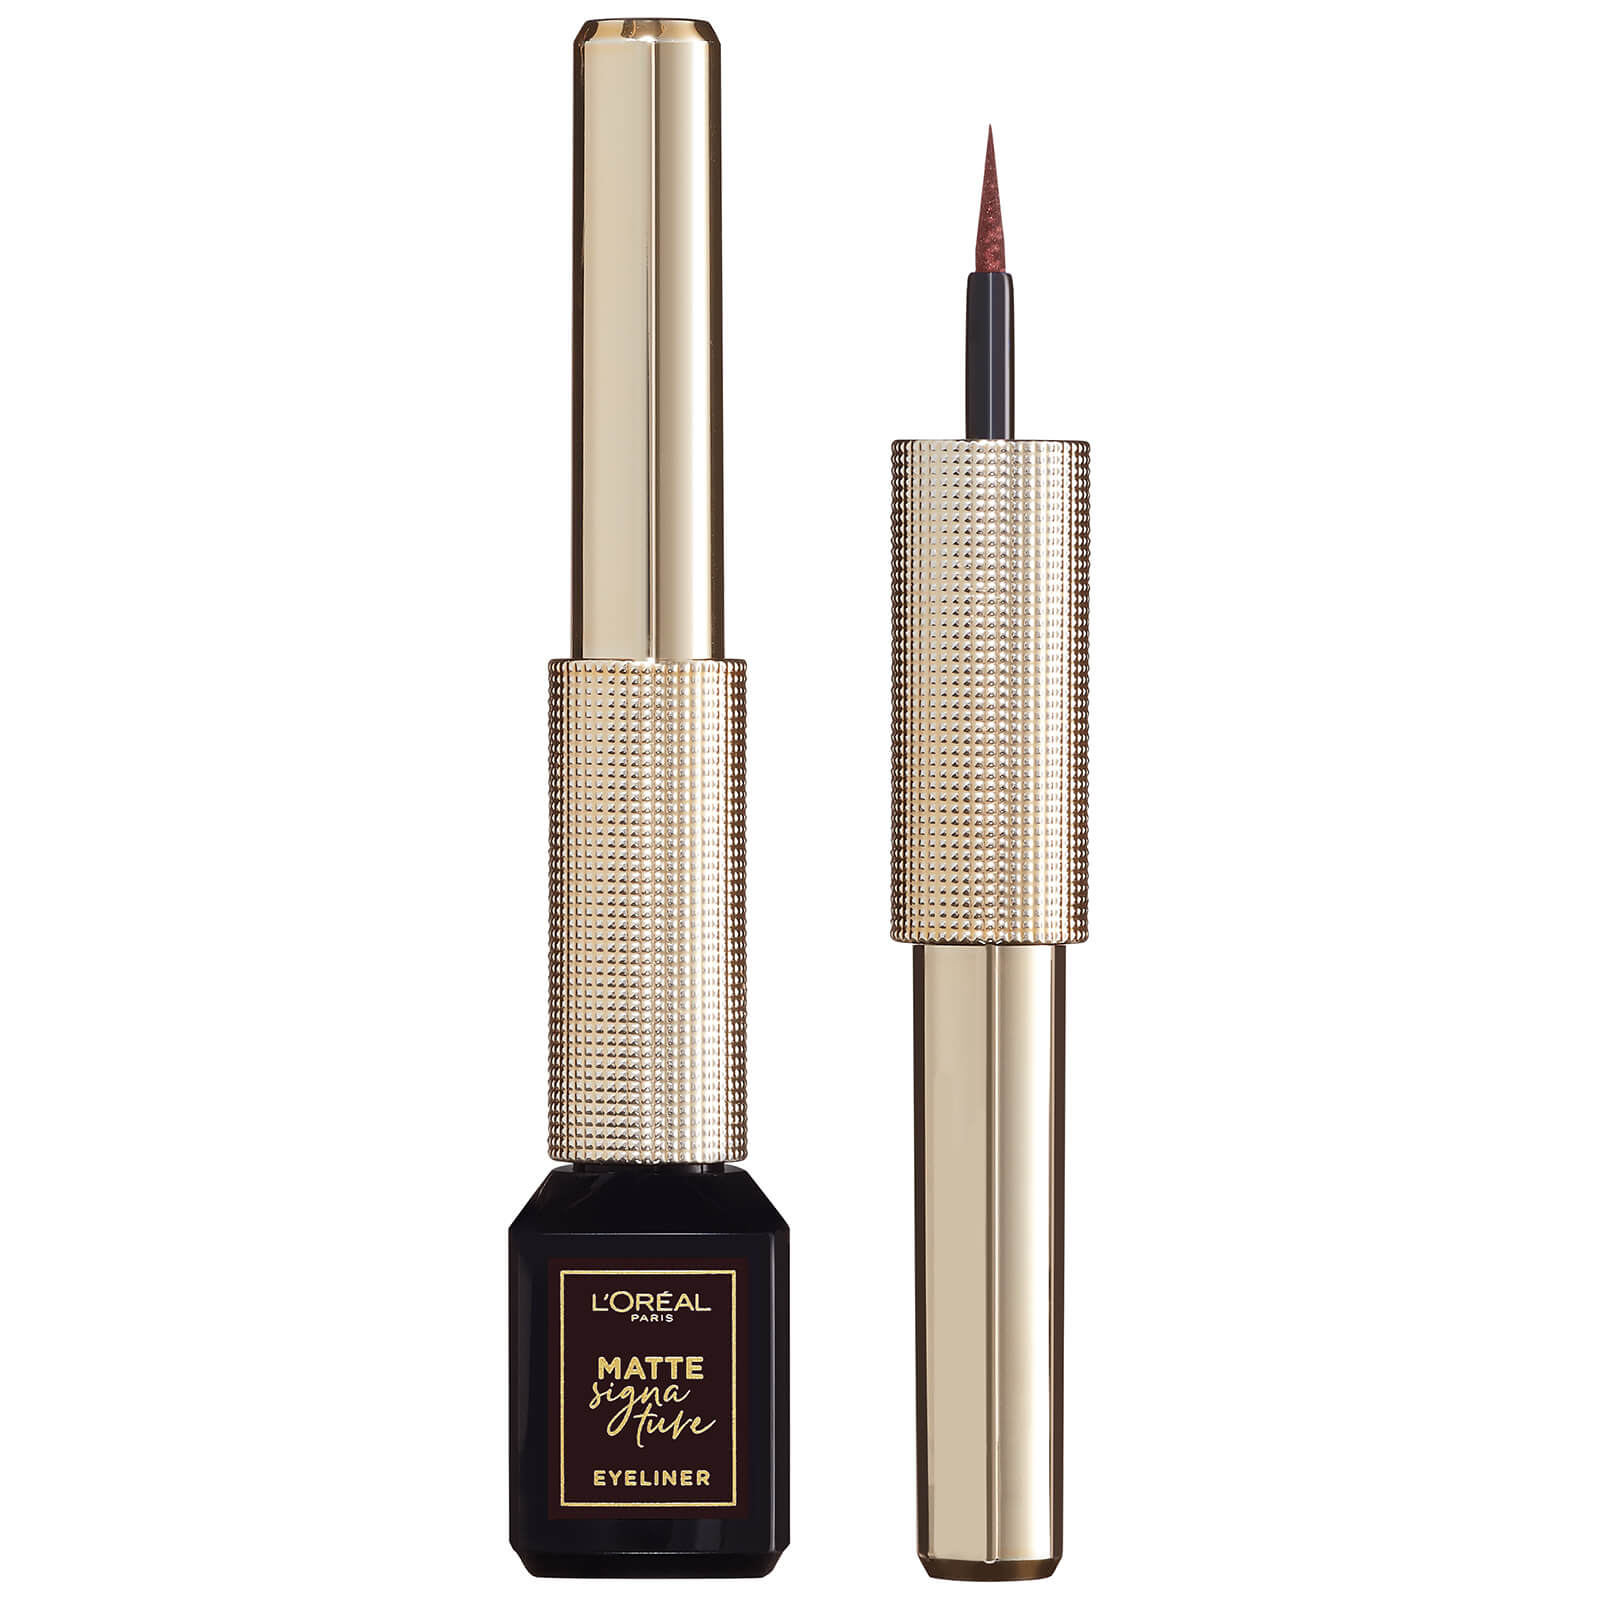 L'Oréal Paris Matte Signature Liquid Eyeliner 3ml (Various Shades) - 03 Brown